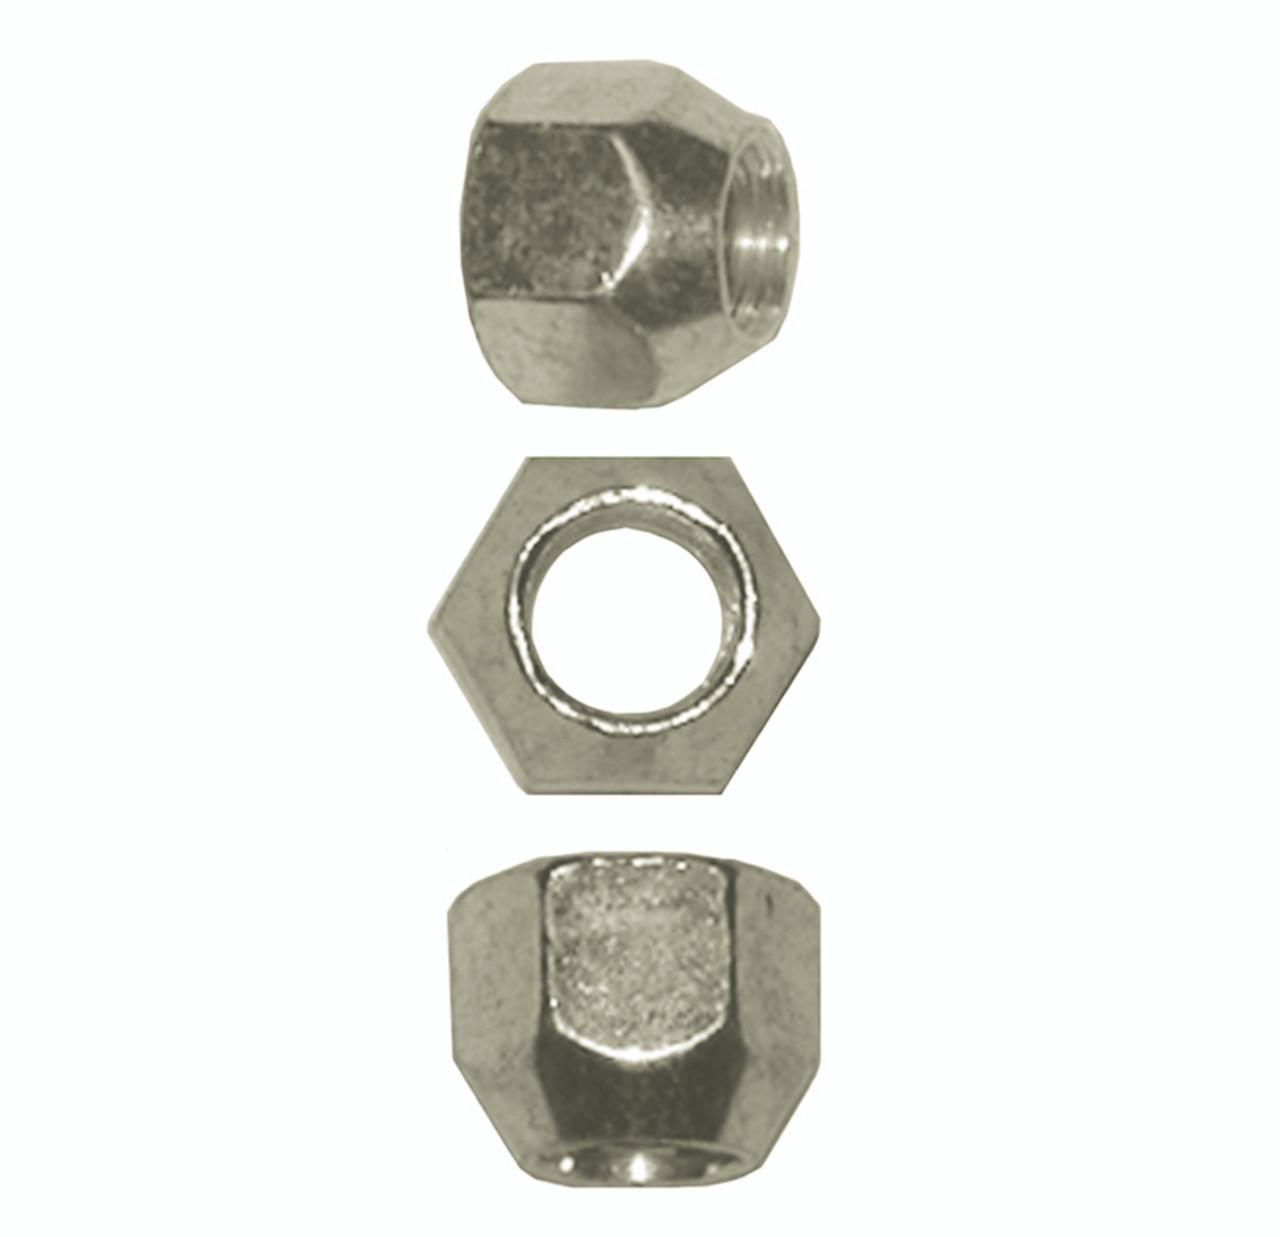 F19374 --- Wheel Nut 1/2 - 20 Right Hand